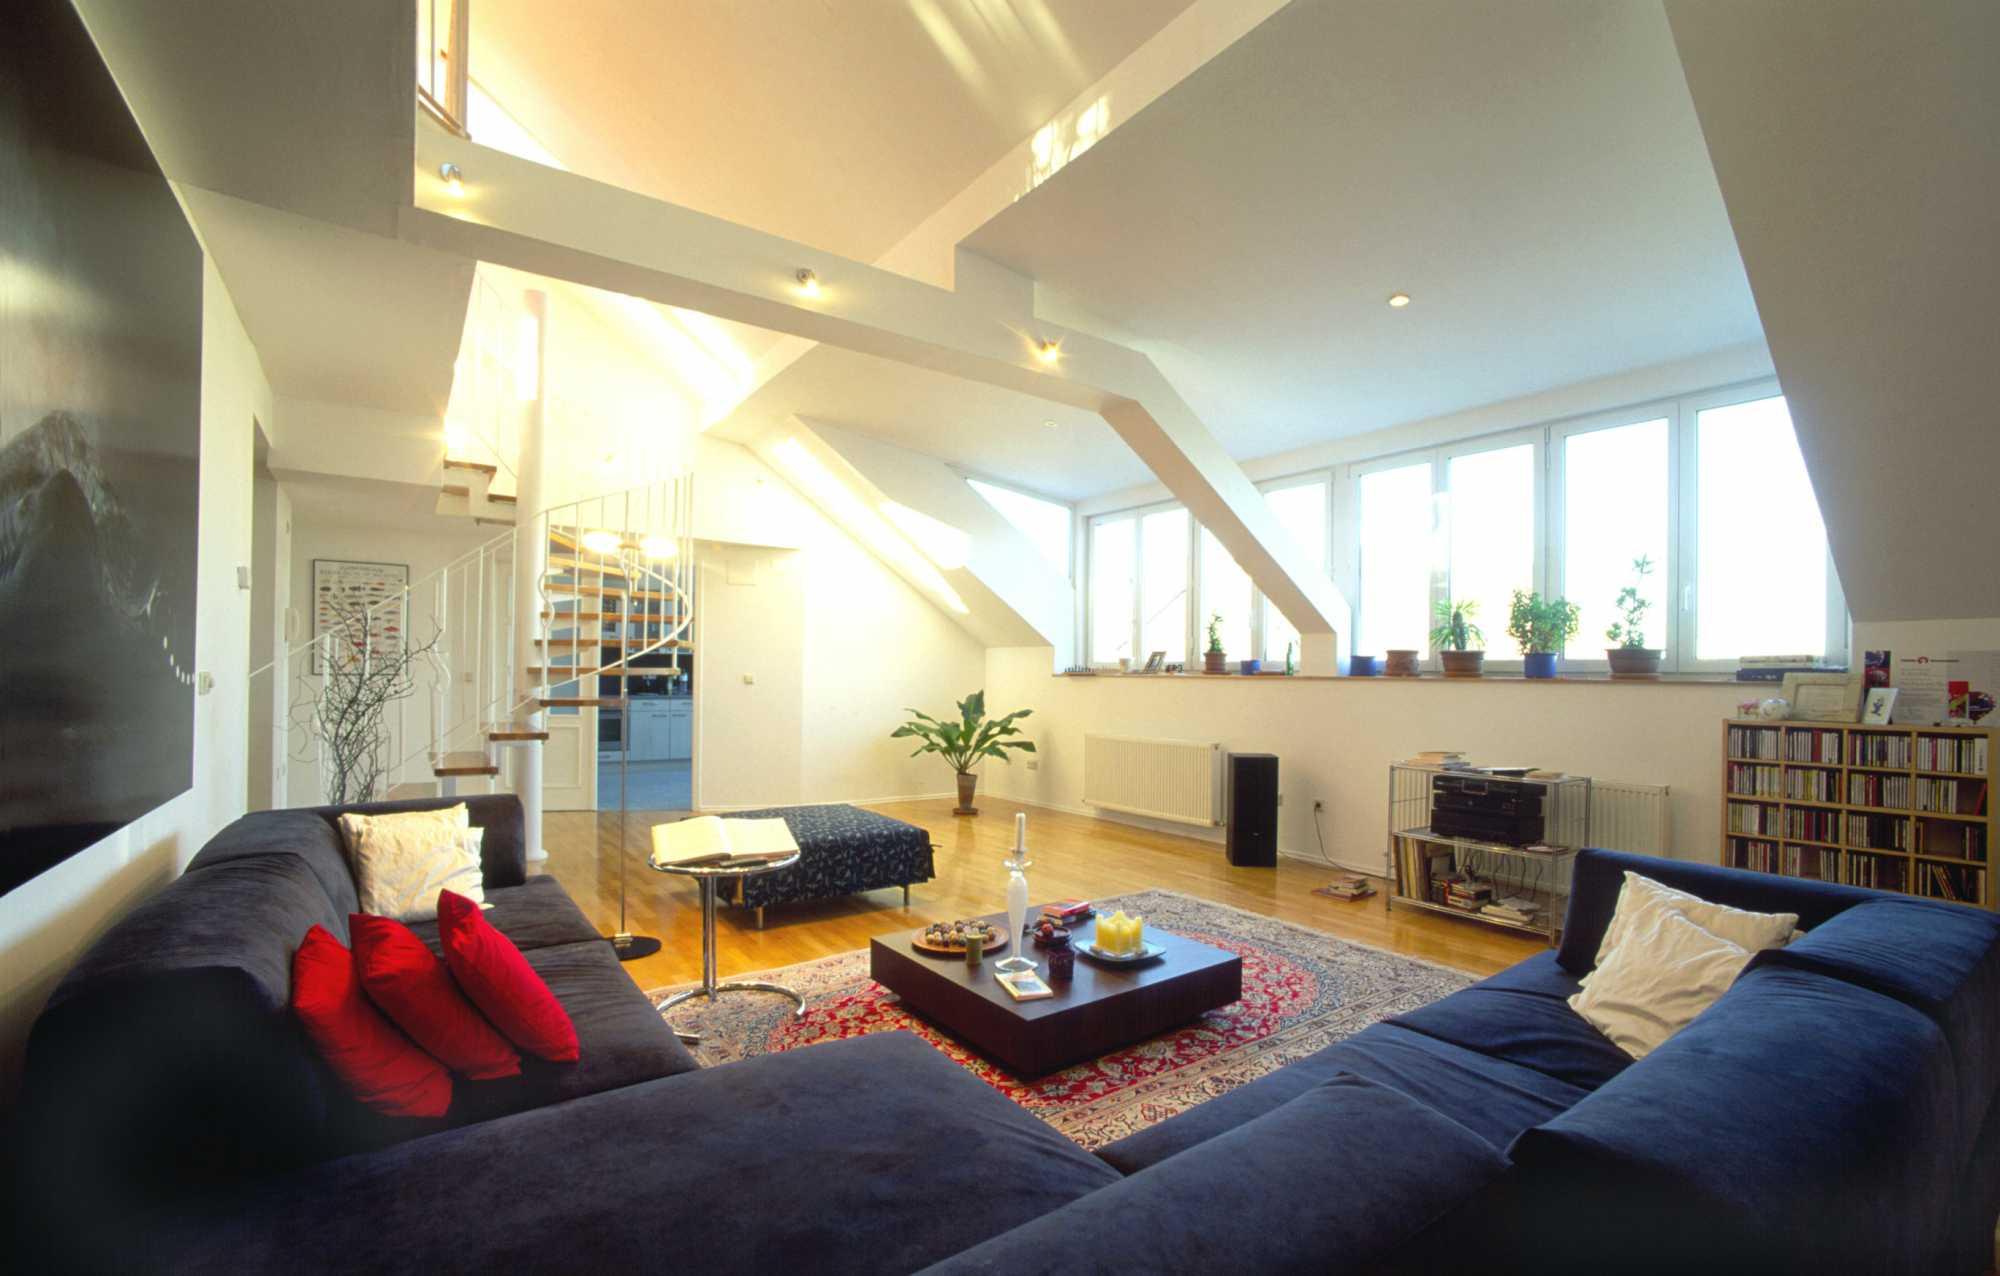 penthouse construction ges m b h alles was sie tun. Black Bedroom Furniture Sets. Home Design Ideas